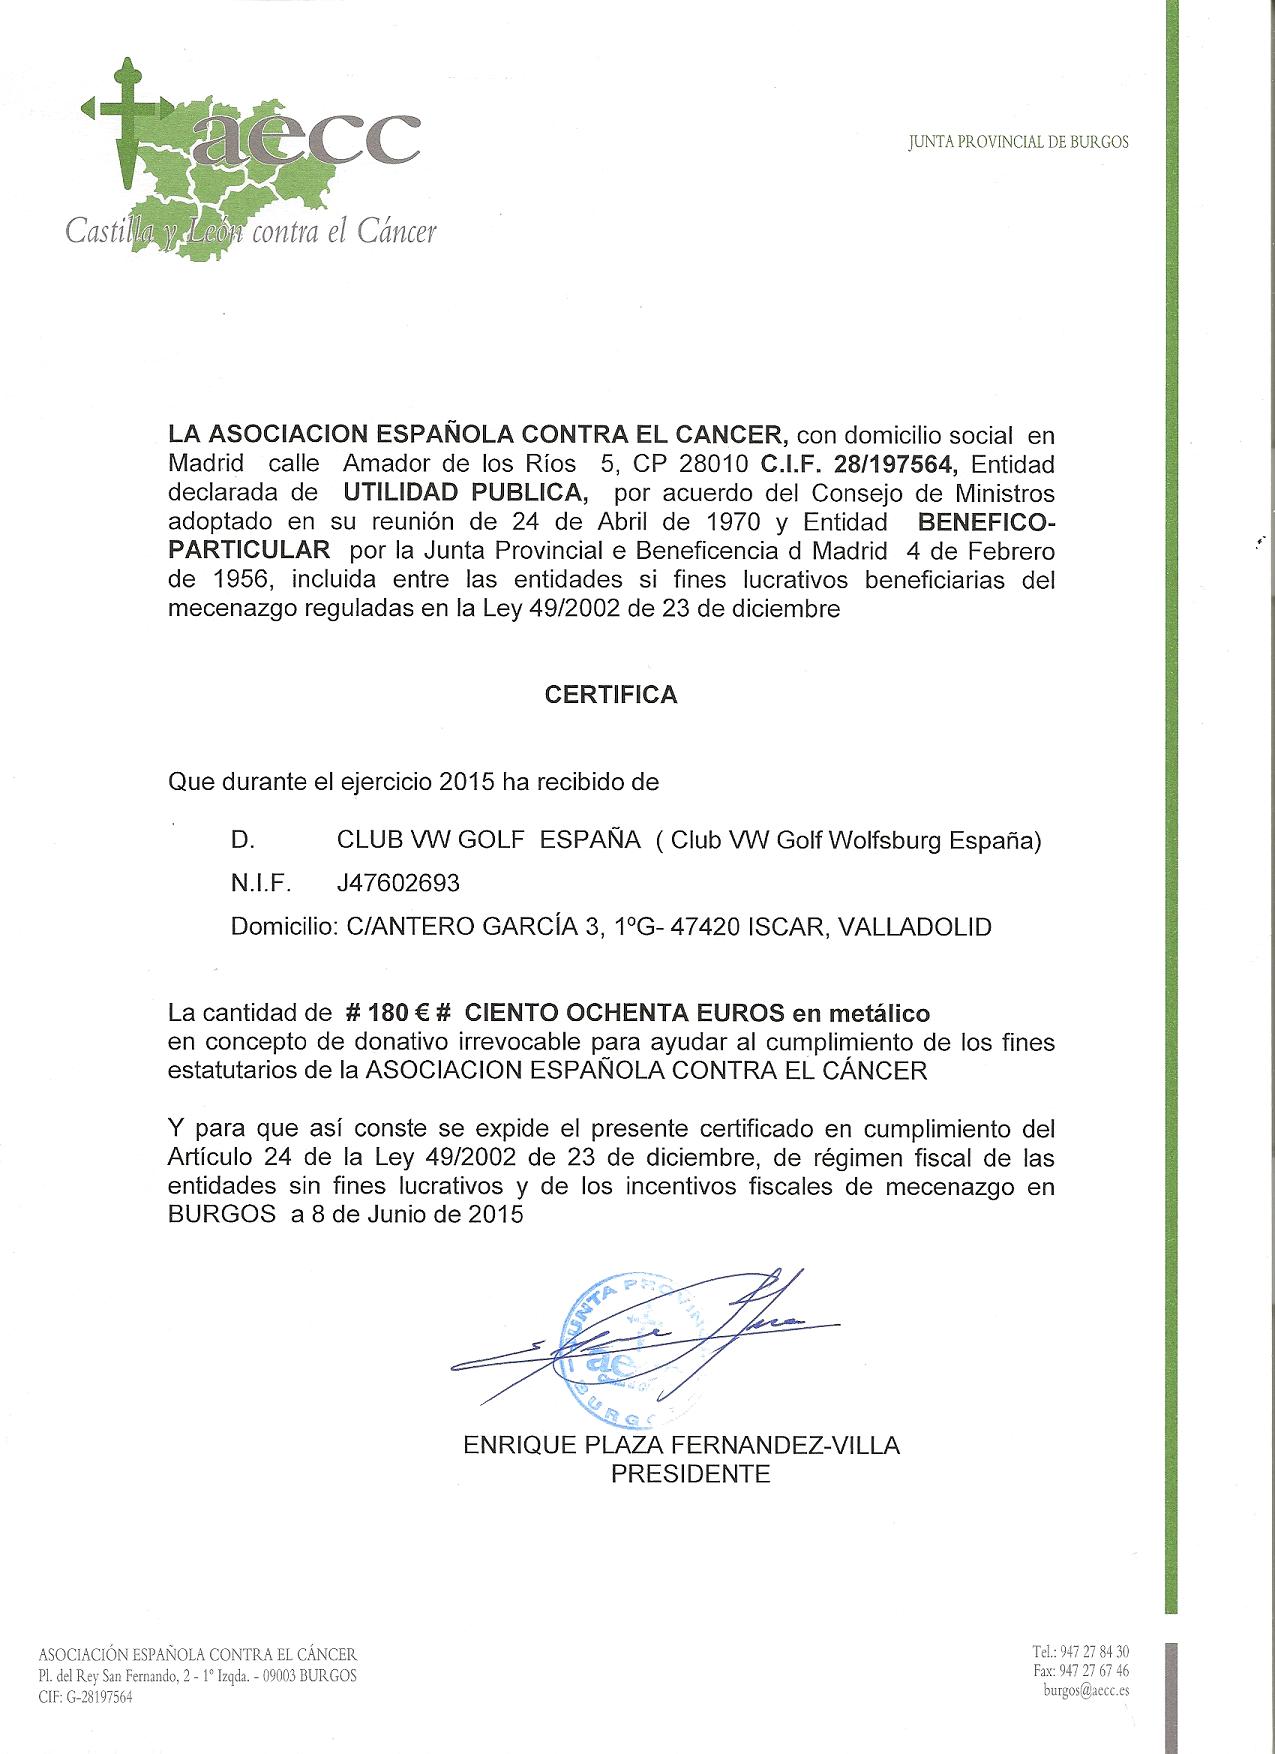 CertificadoAECC.png